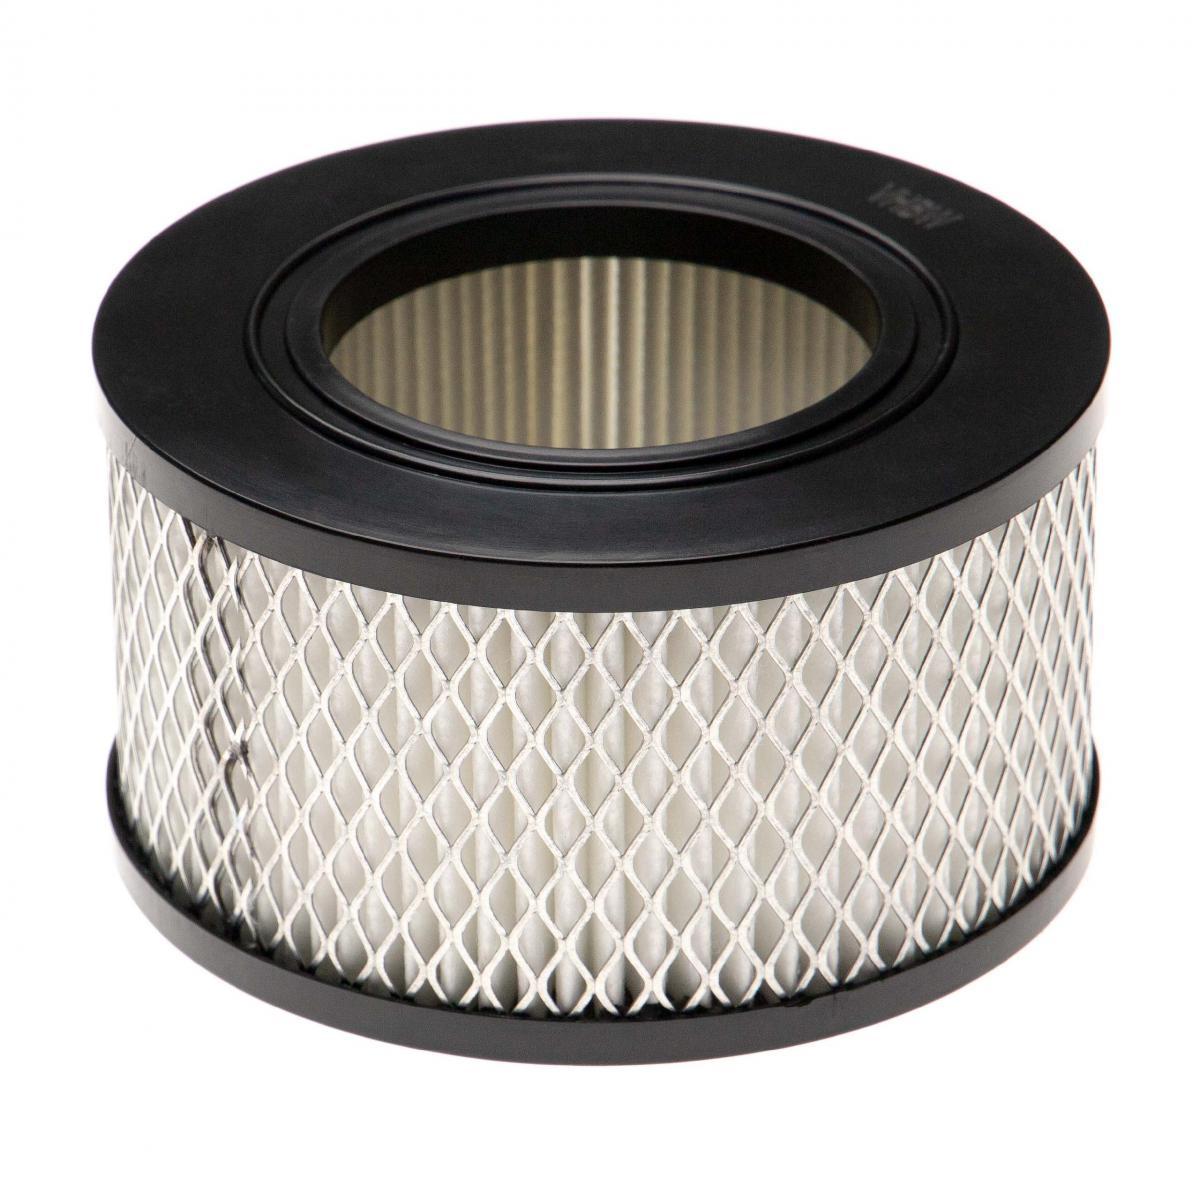 Vhbw vhbw Filtre compatible avec Nilfisk Attix 33-2H PC, 33-2M IC, 33-xx, 44-2H IC, 44-2M IC, 44-xx aspirateur - filtre HEPA